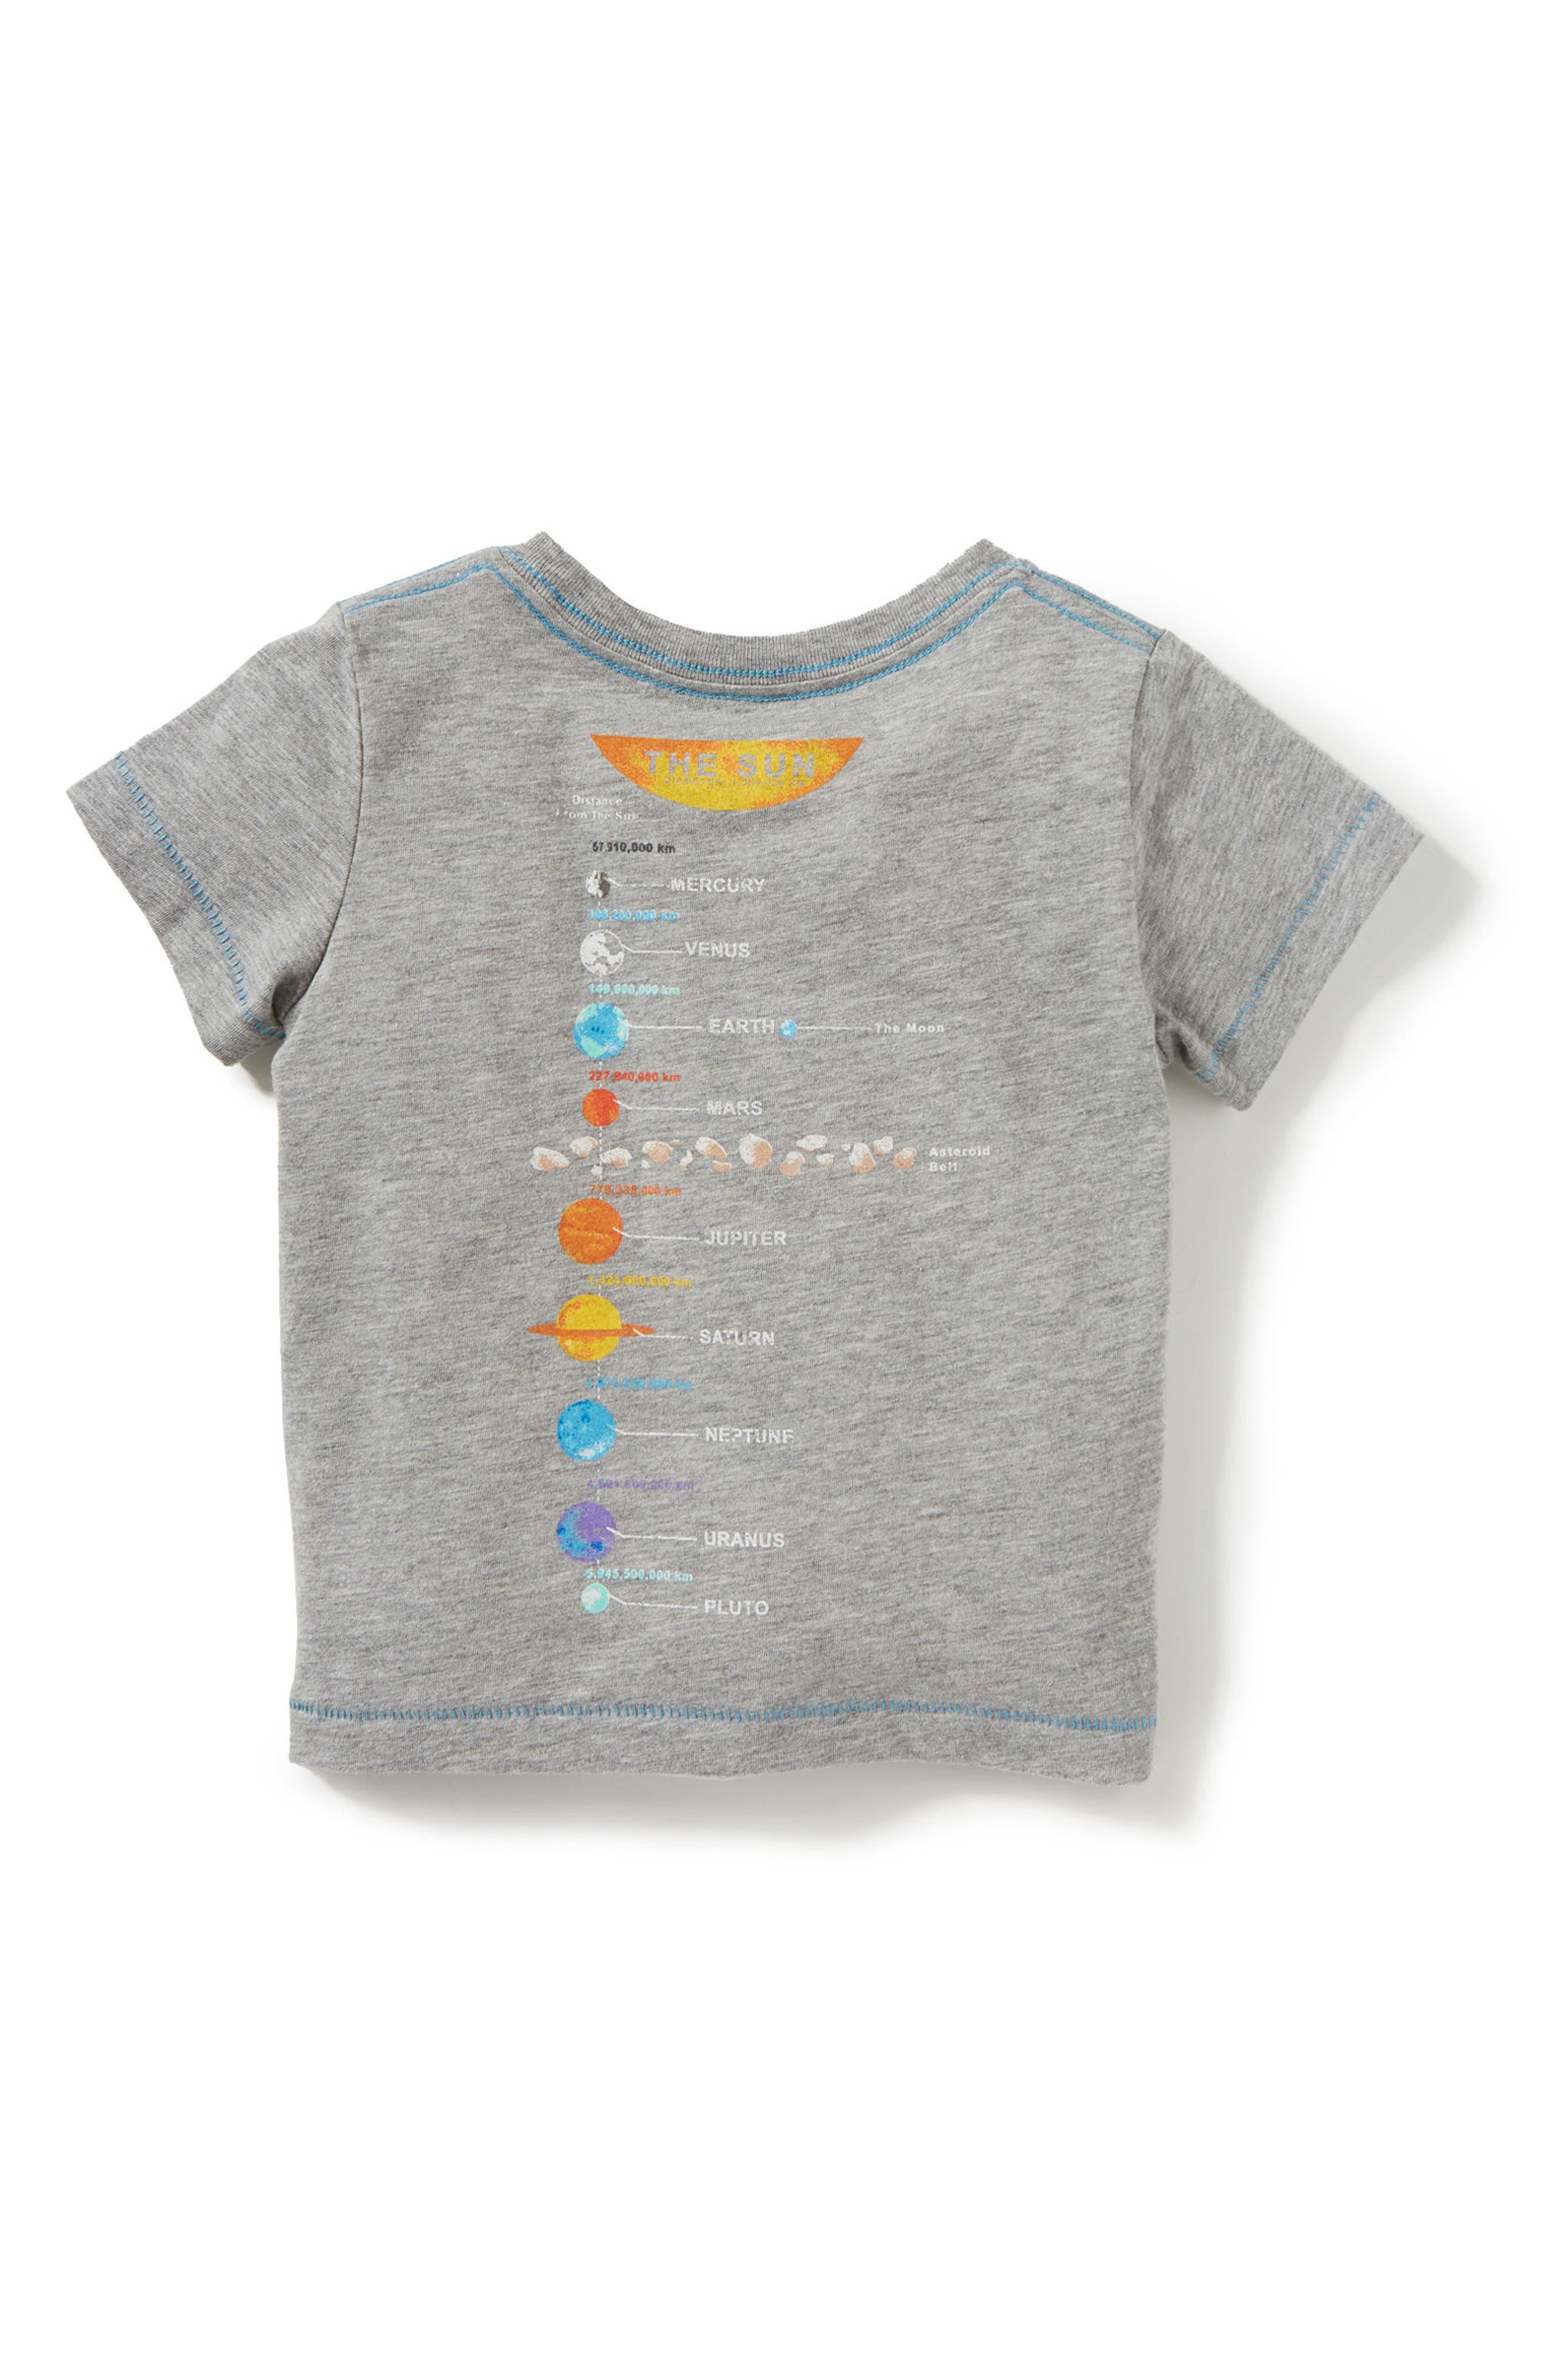 Everything Revolves Around Me T-Shirt,                             Alternate thumbnail 2, color,                             Light Heather Grey